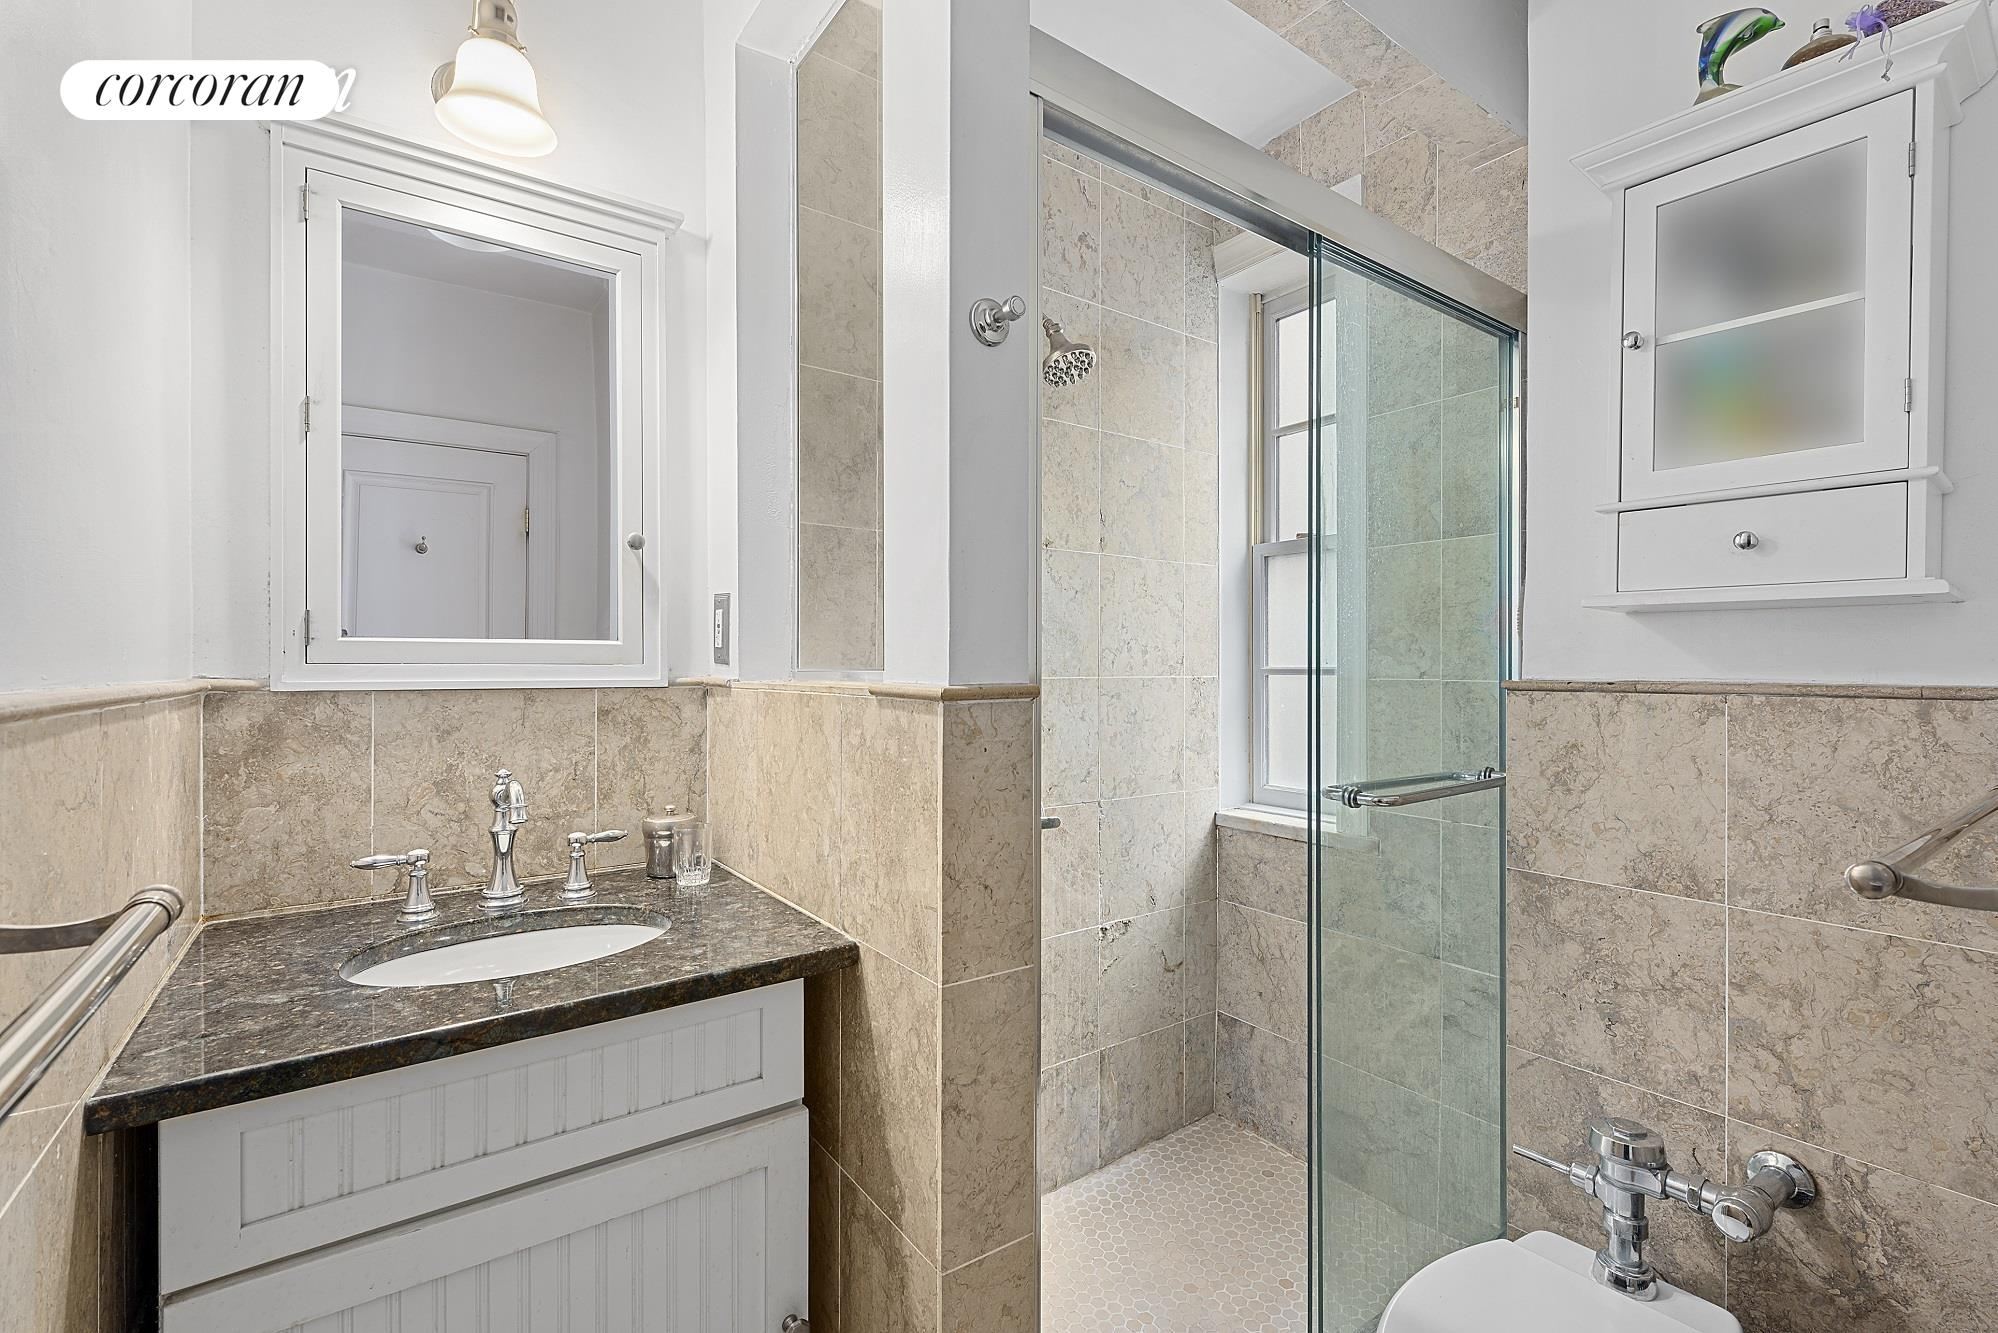 35 East 9th Street Greenwich Village New York NY 10003